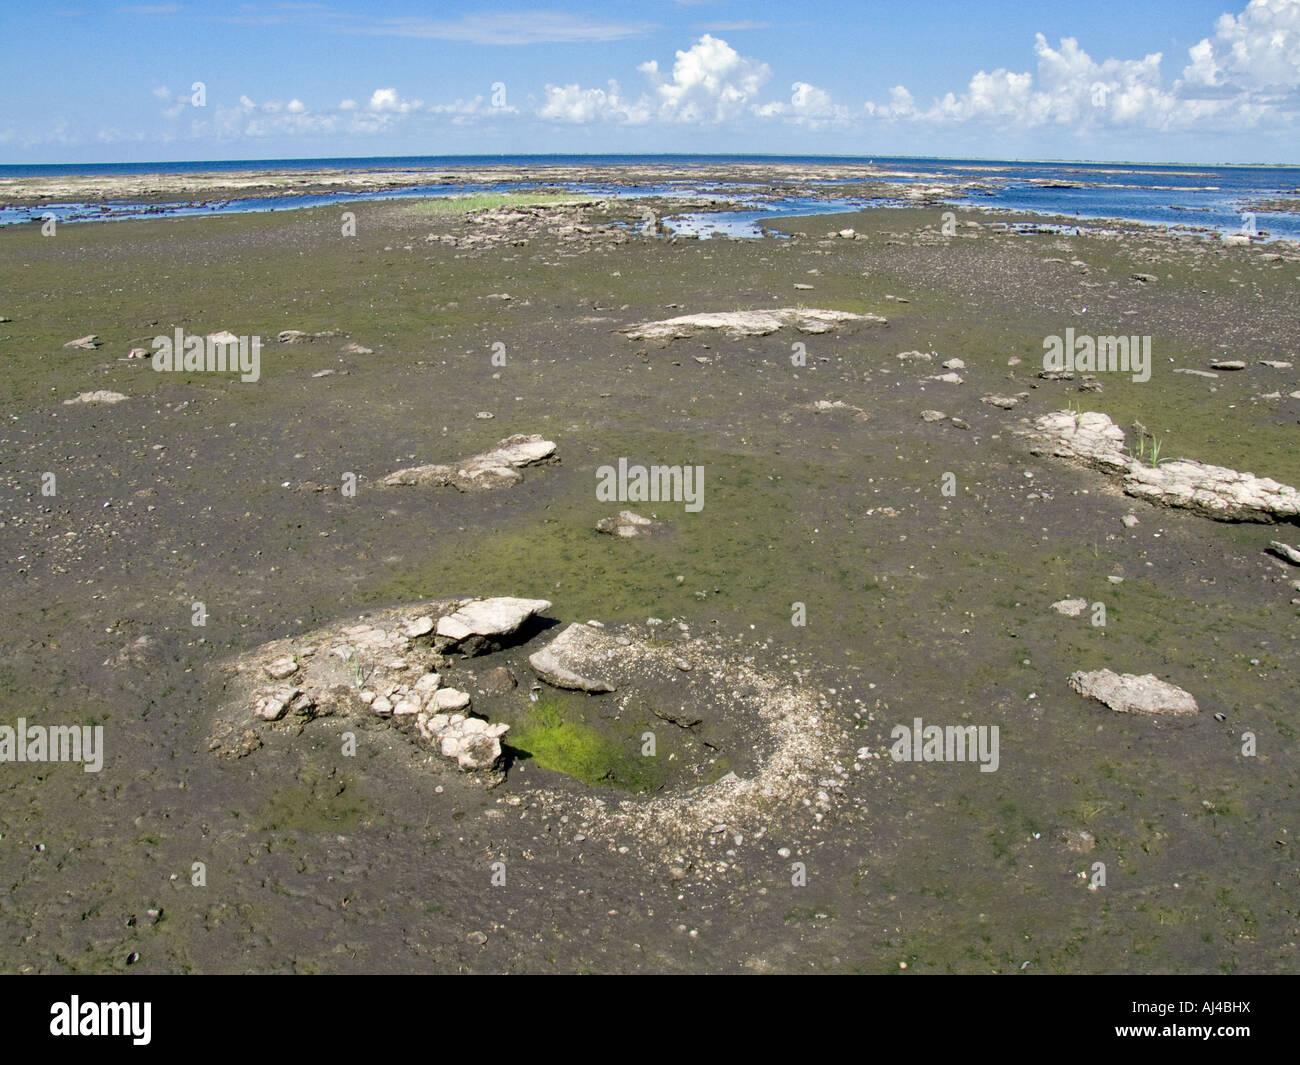 Lake okeechobee florida drought 2007 fl exposed lake for Florida lake fish